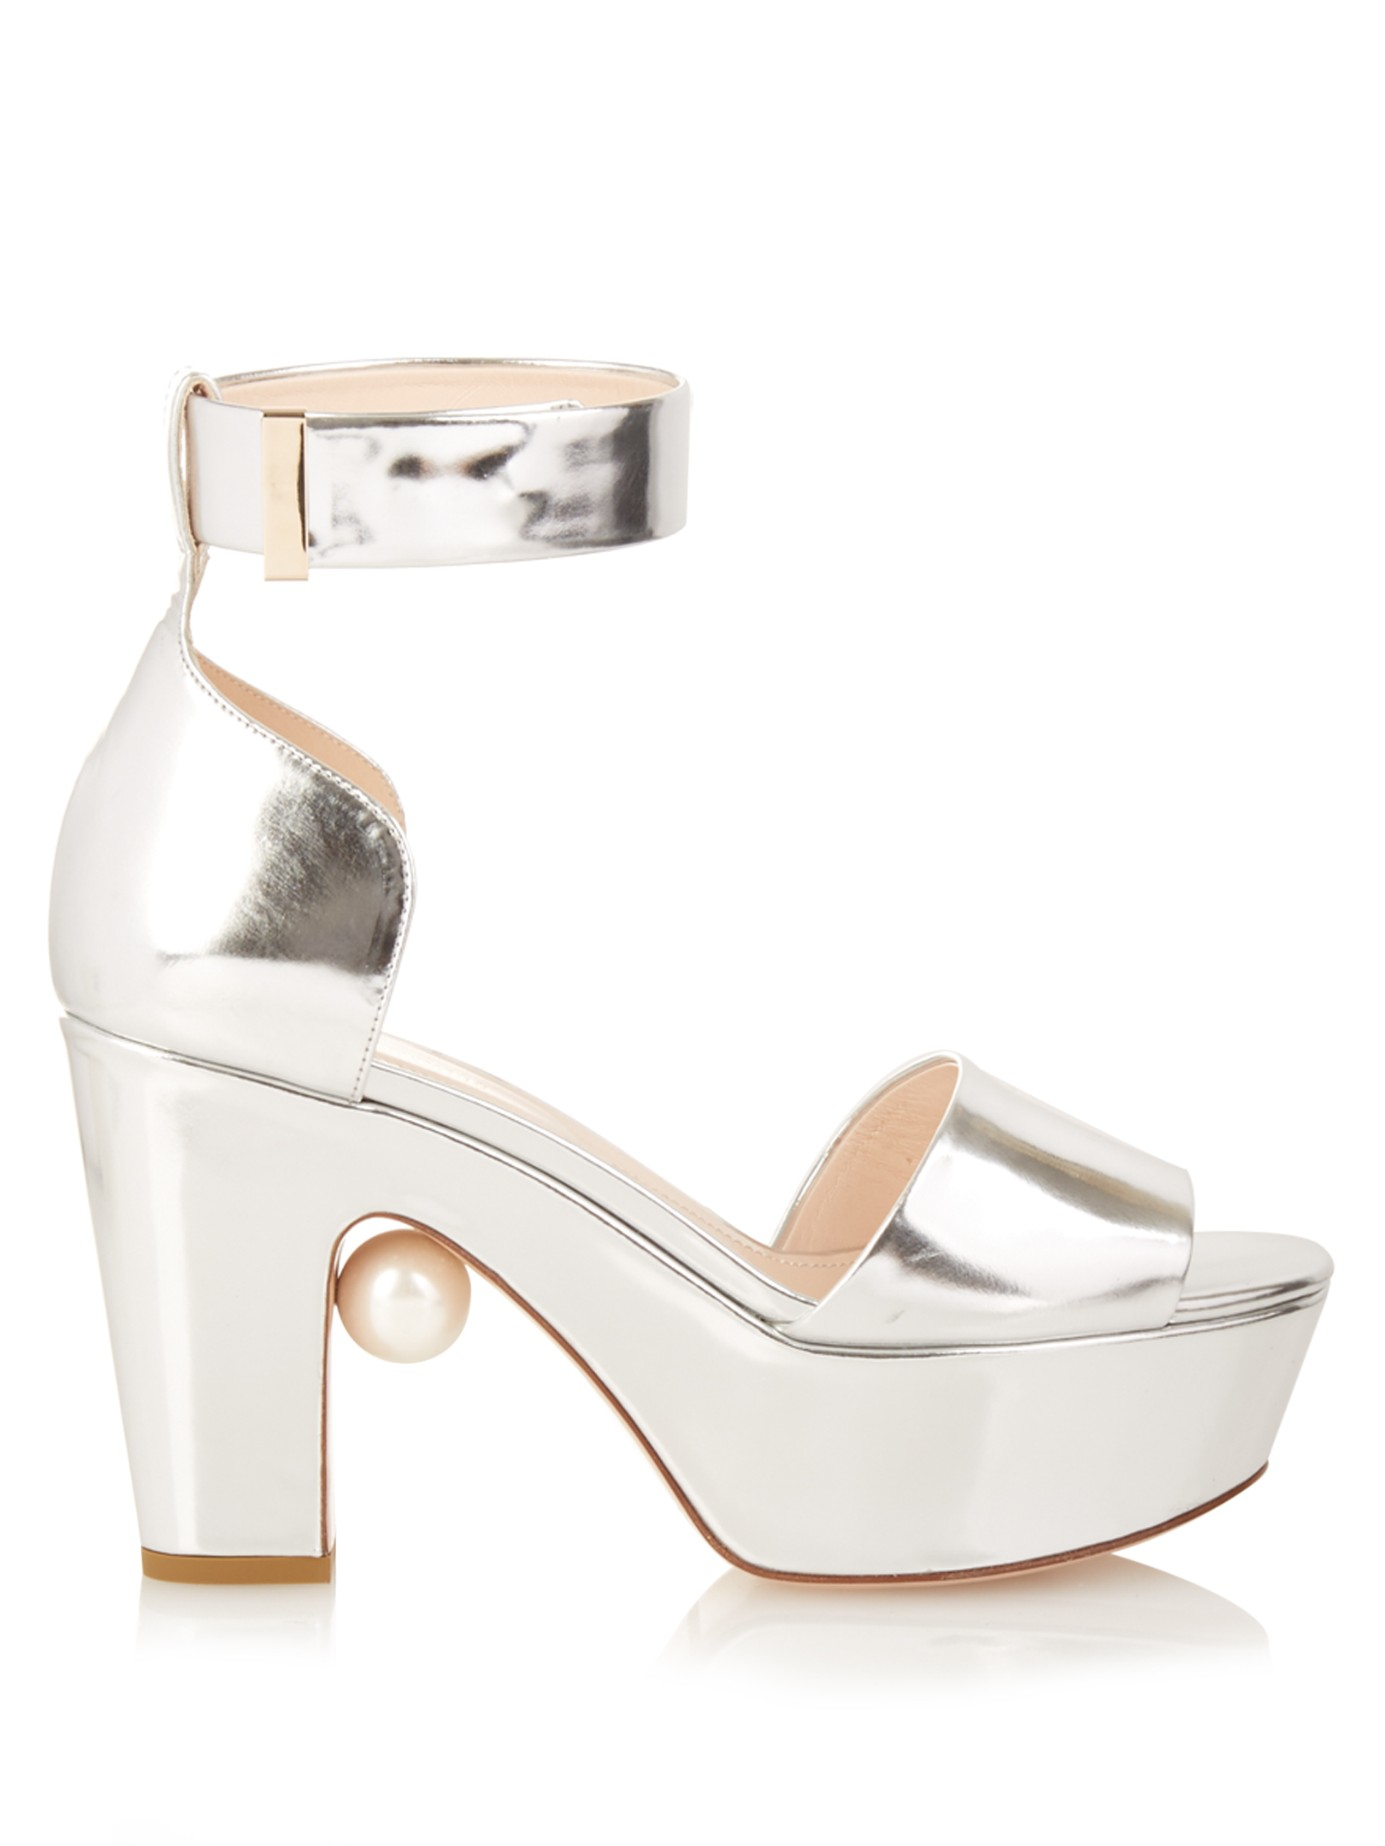 41bd0a425fa Lyst - Nicholas Kirkwood Maya Pearl-embellished Block-heeled Sandals ...